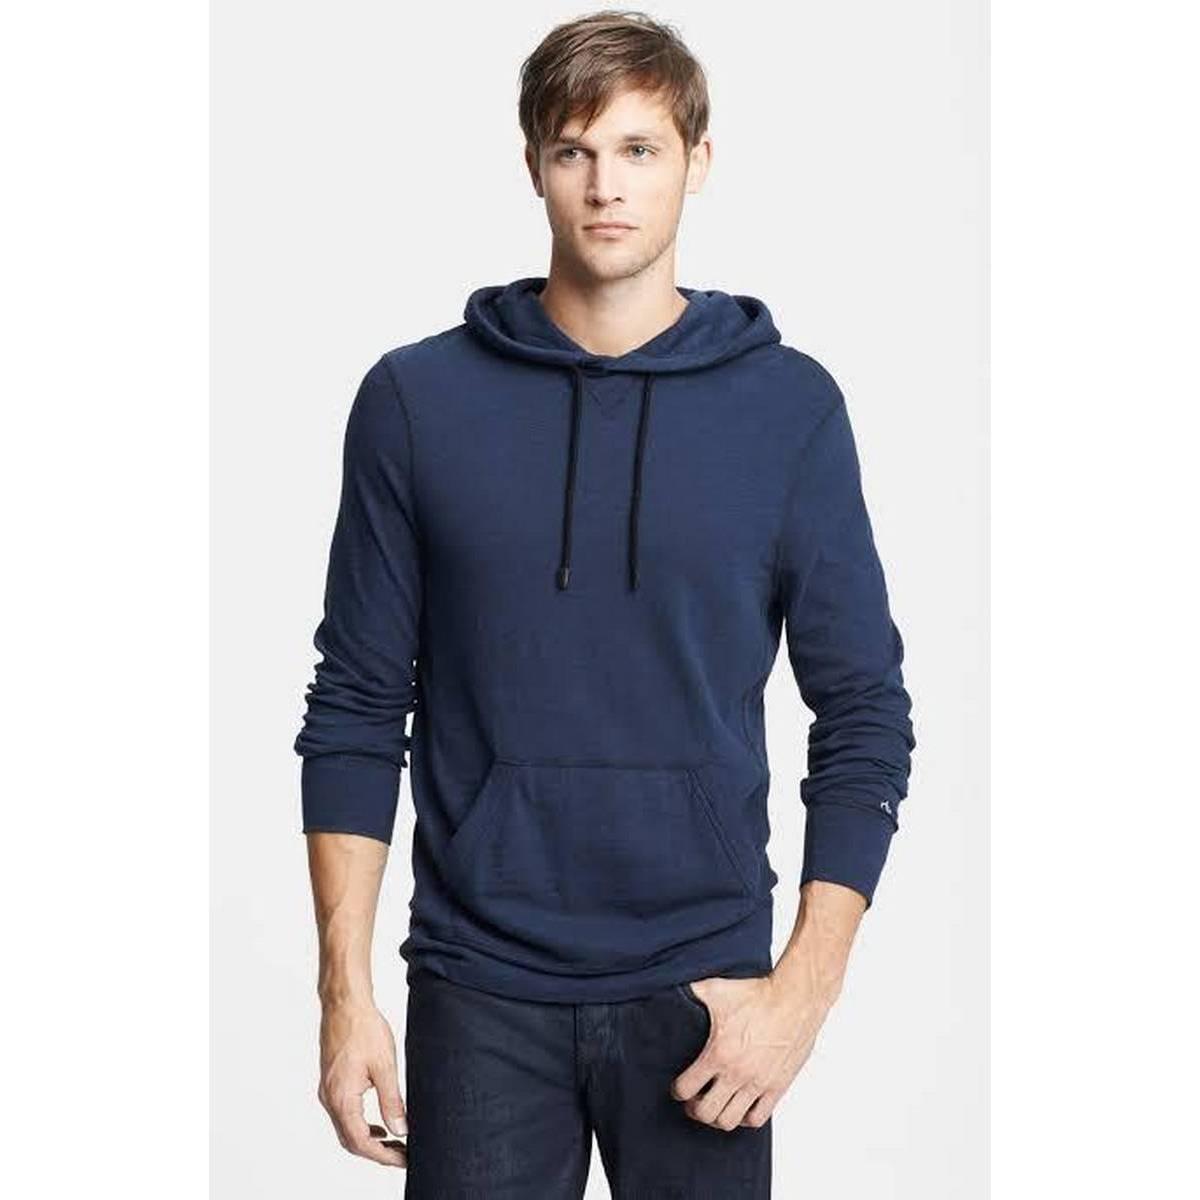 Plain kangro hoodie for men and women